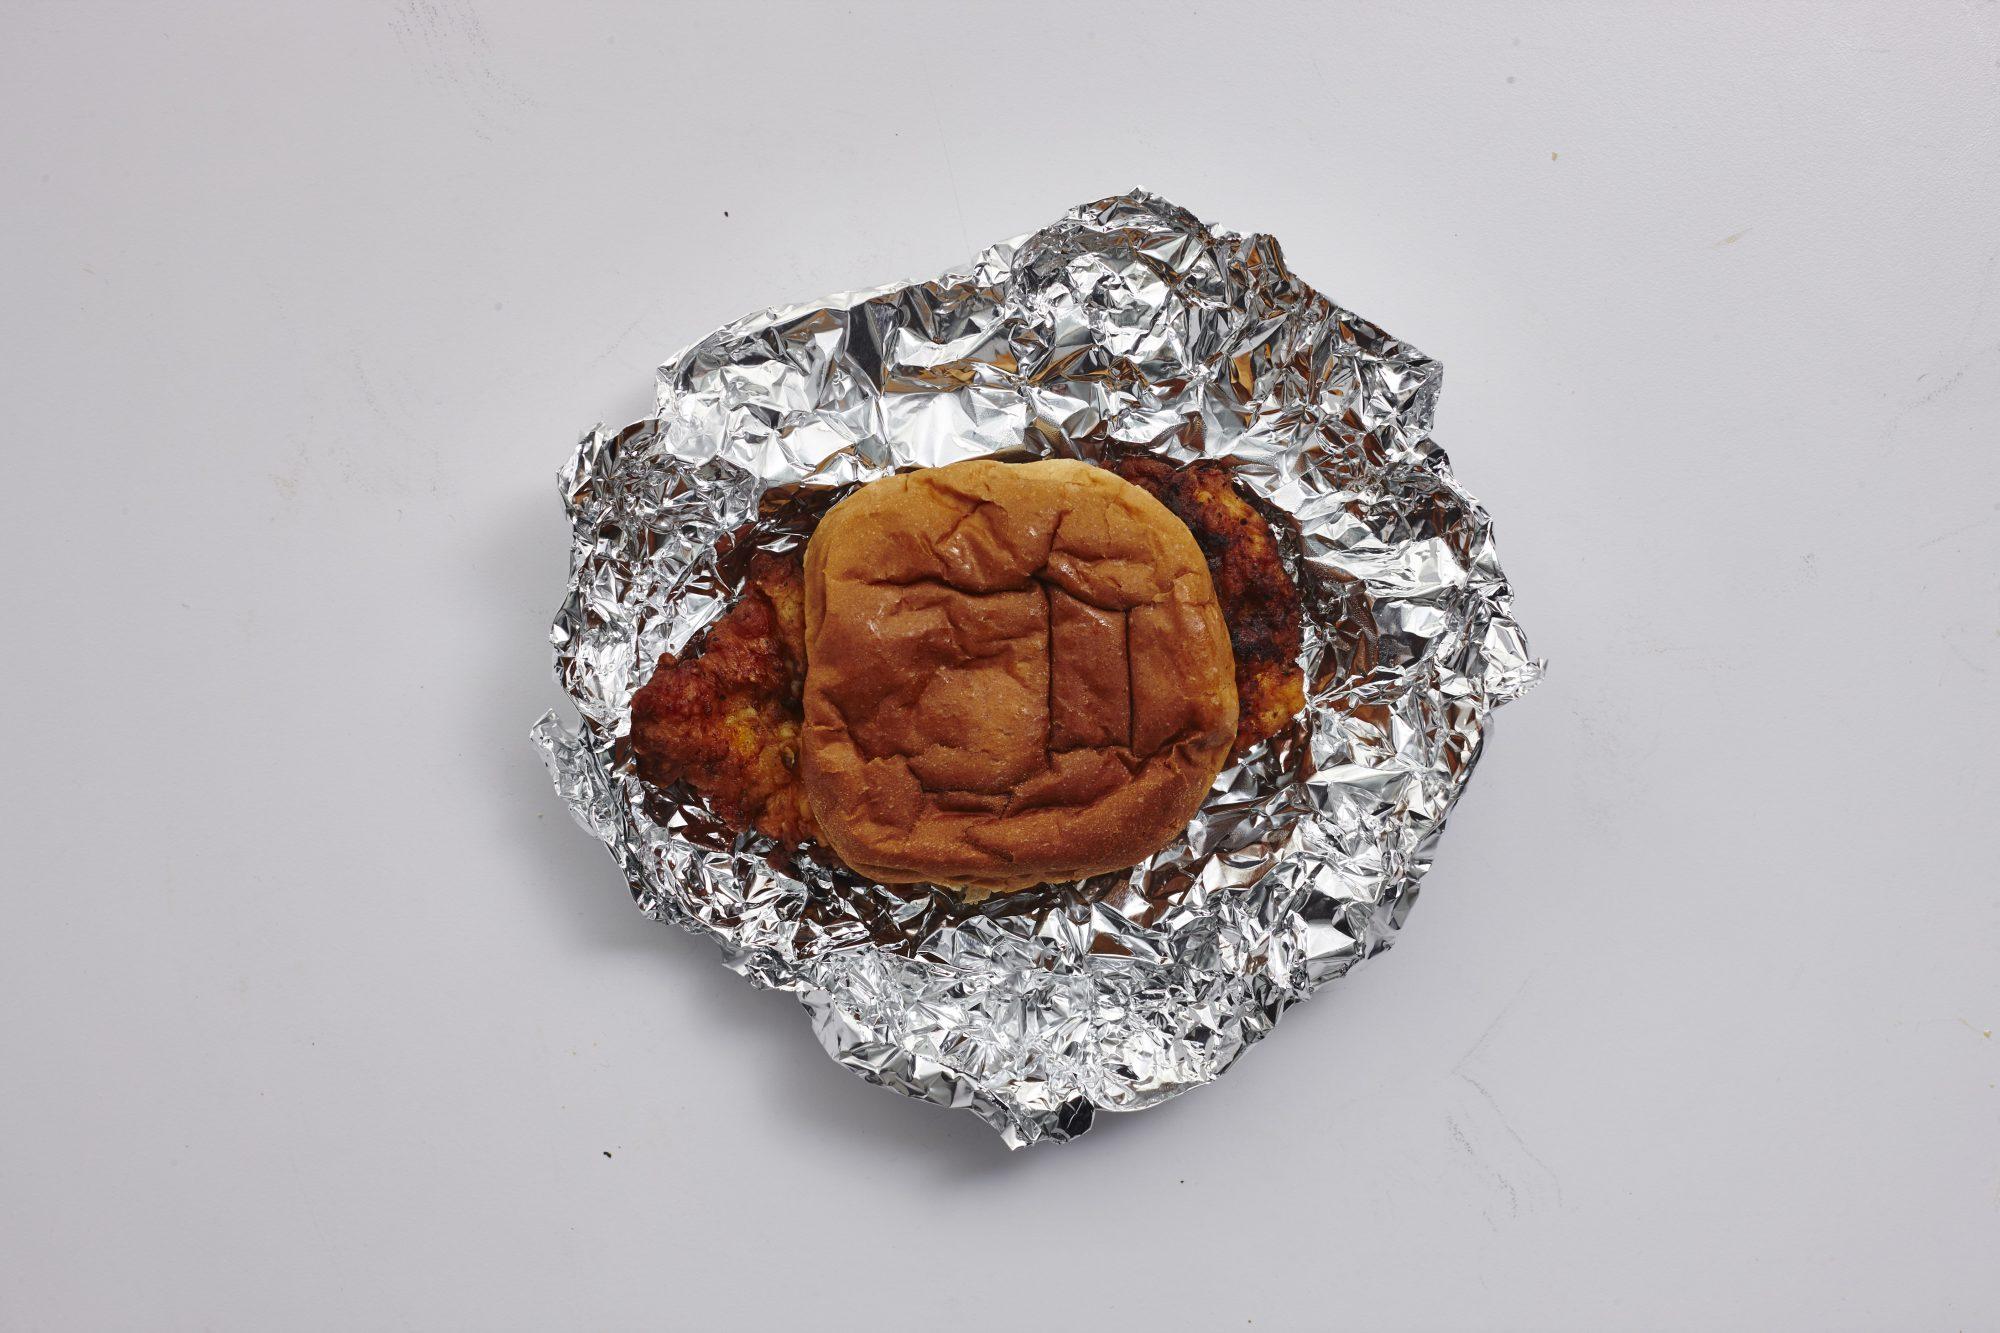 Copycat Chick-Fil-A Sandwich image